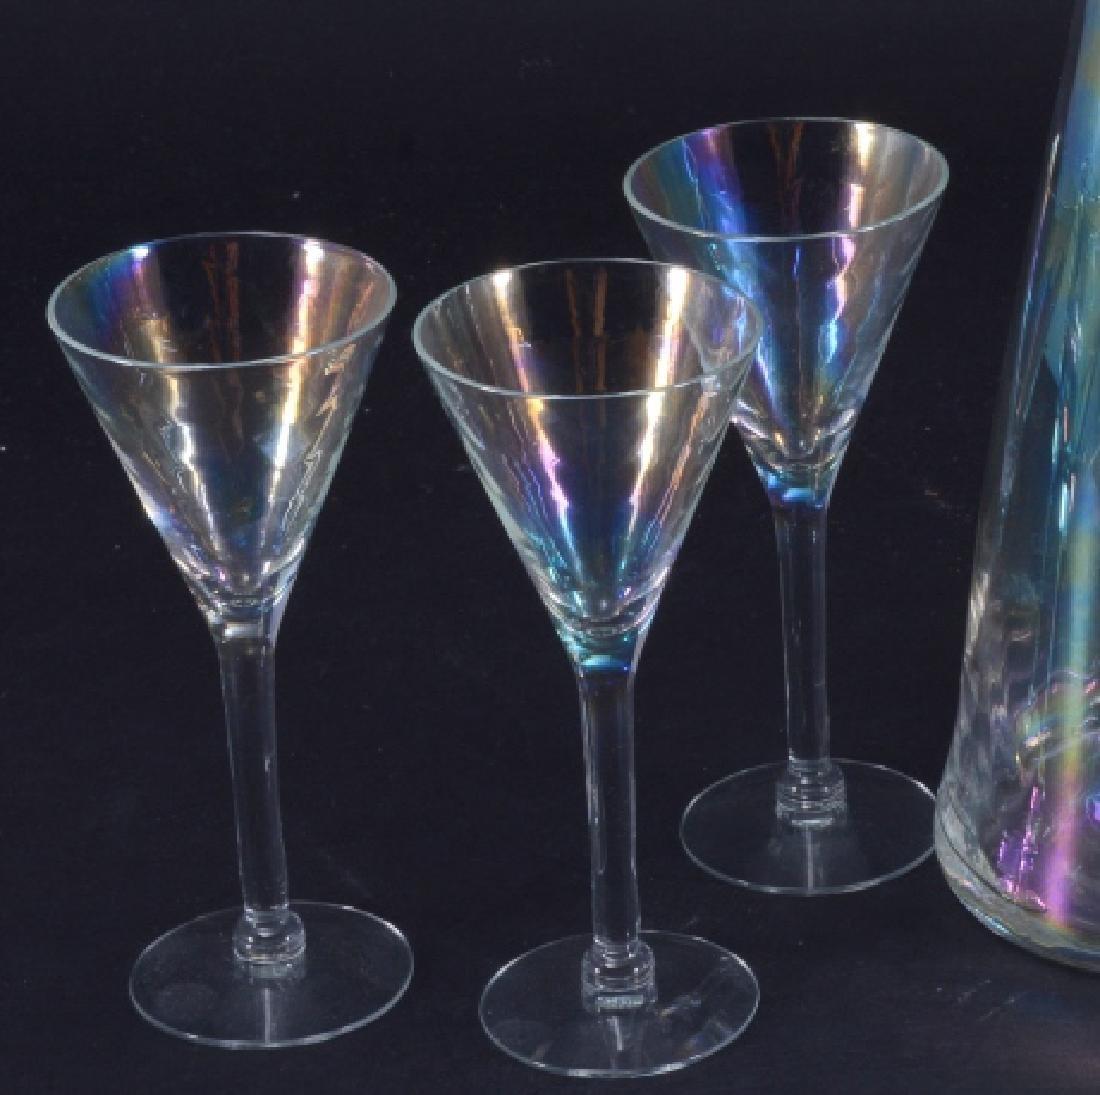 Iridescent Decanter & Glasses - 3